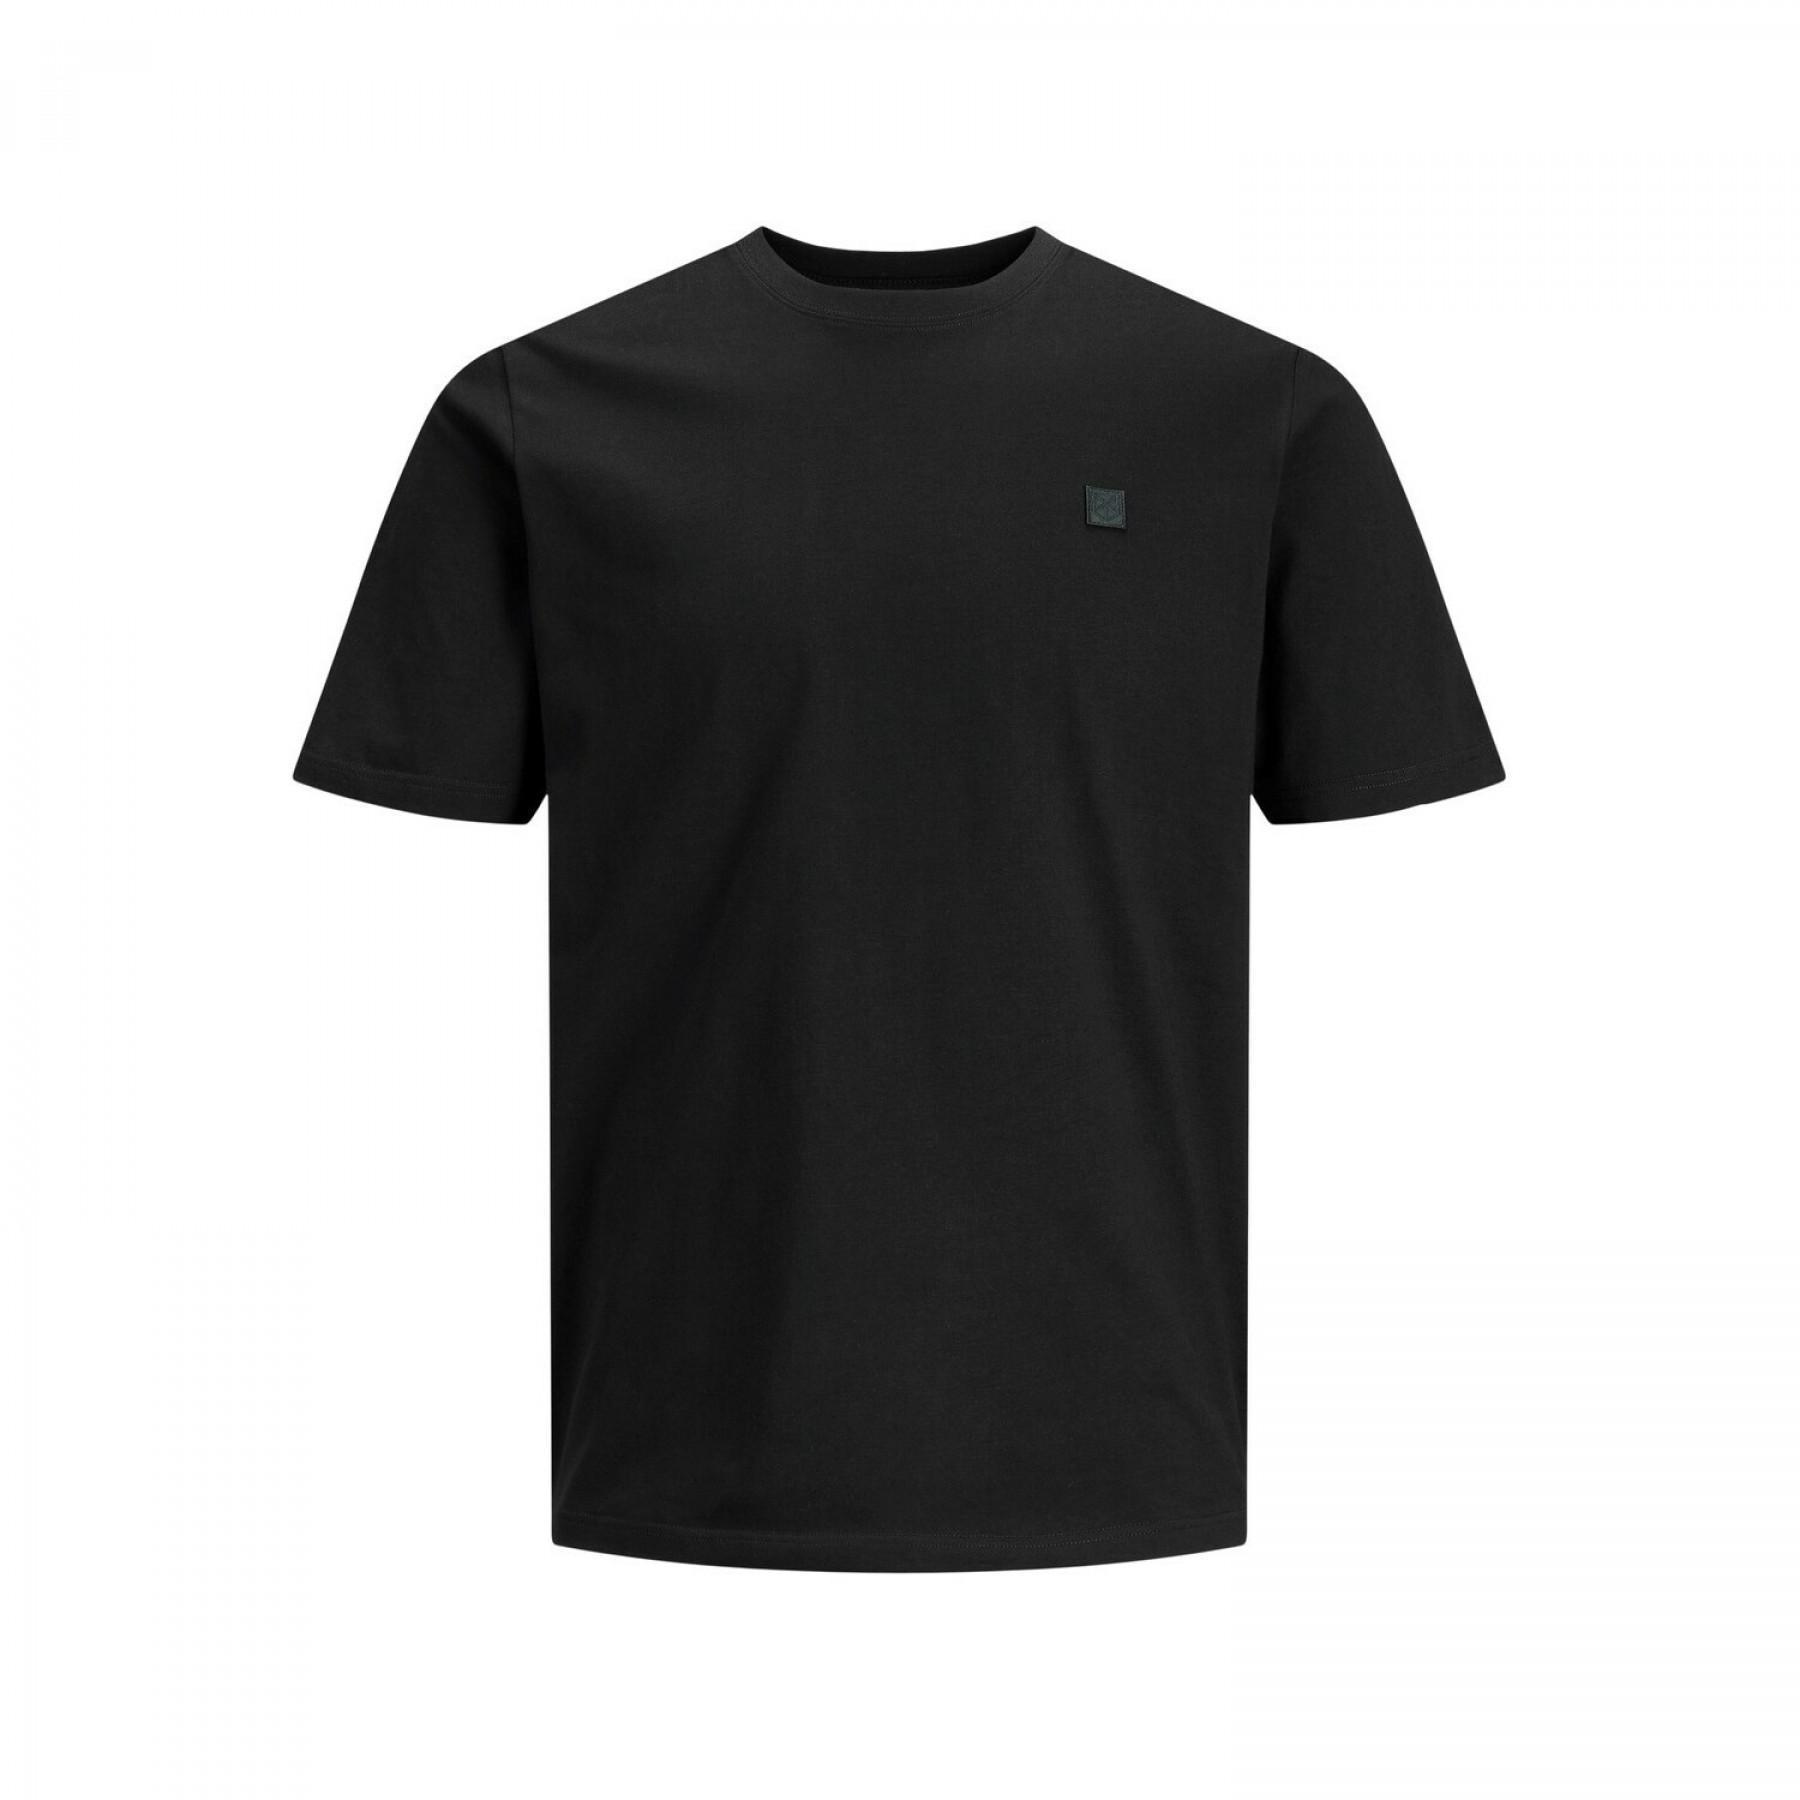 Jack & Jones Blastudio T-shirt